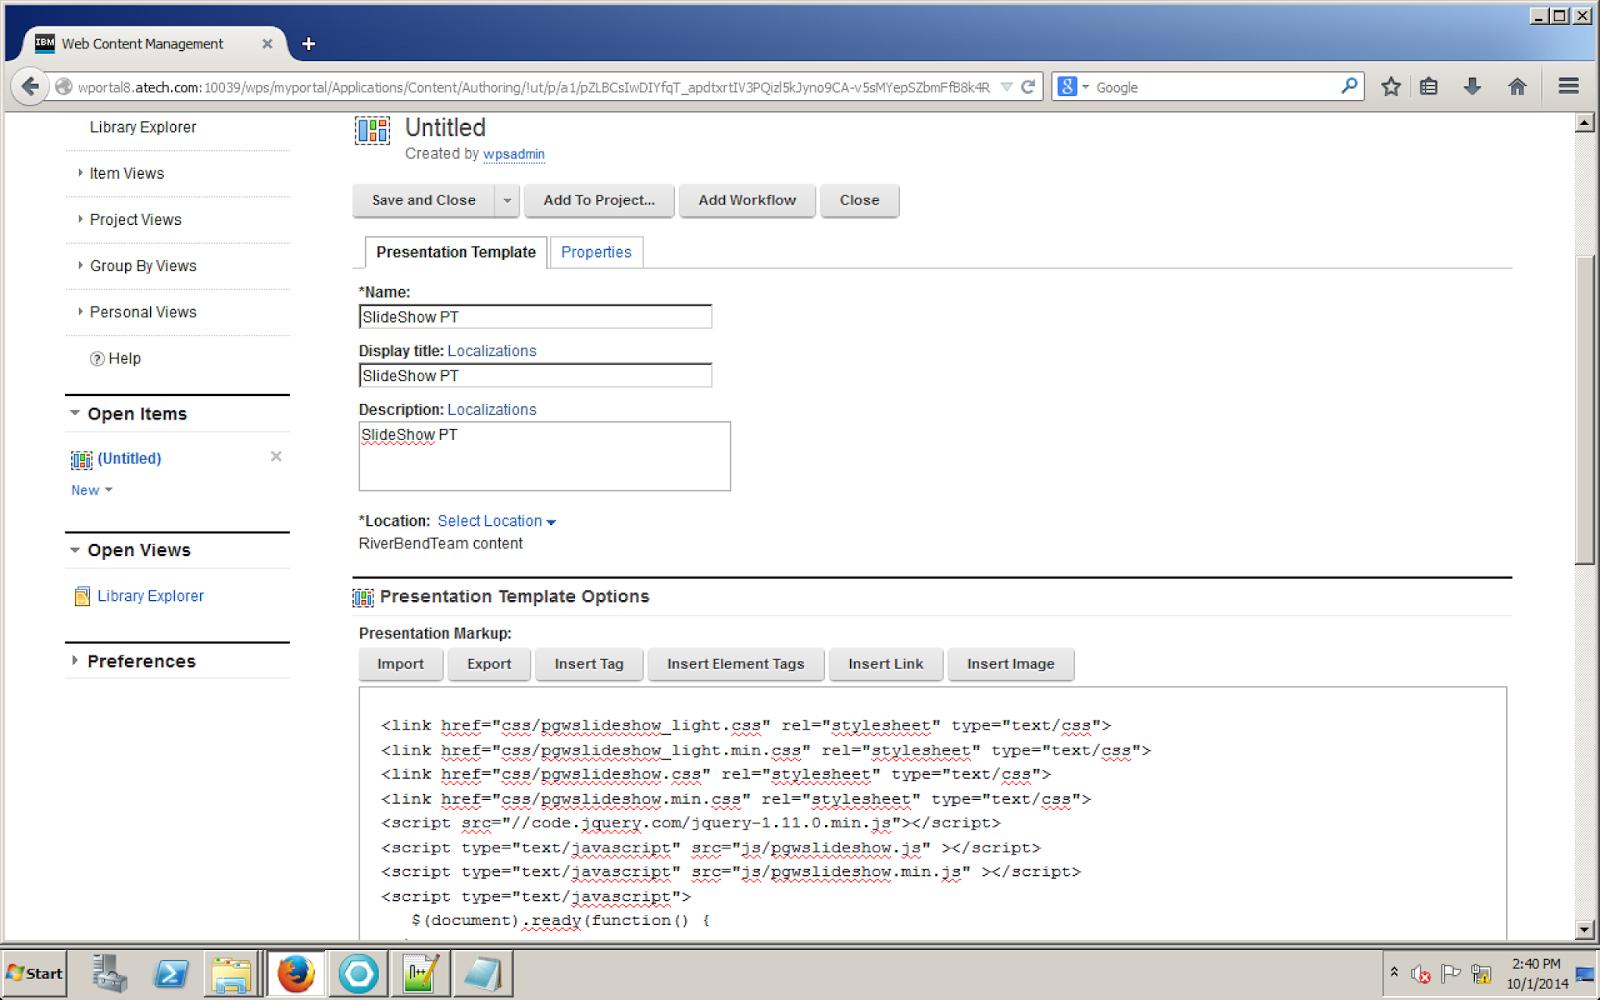 java , j2ee , javascript , algorithms and data structure insights, Presentation templates